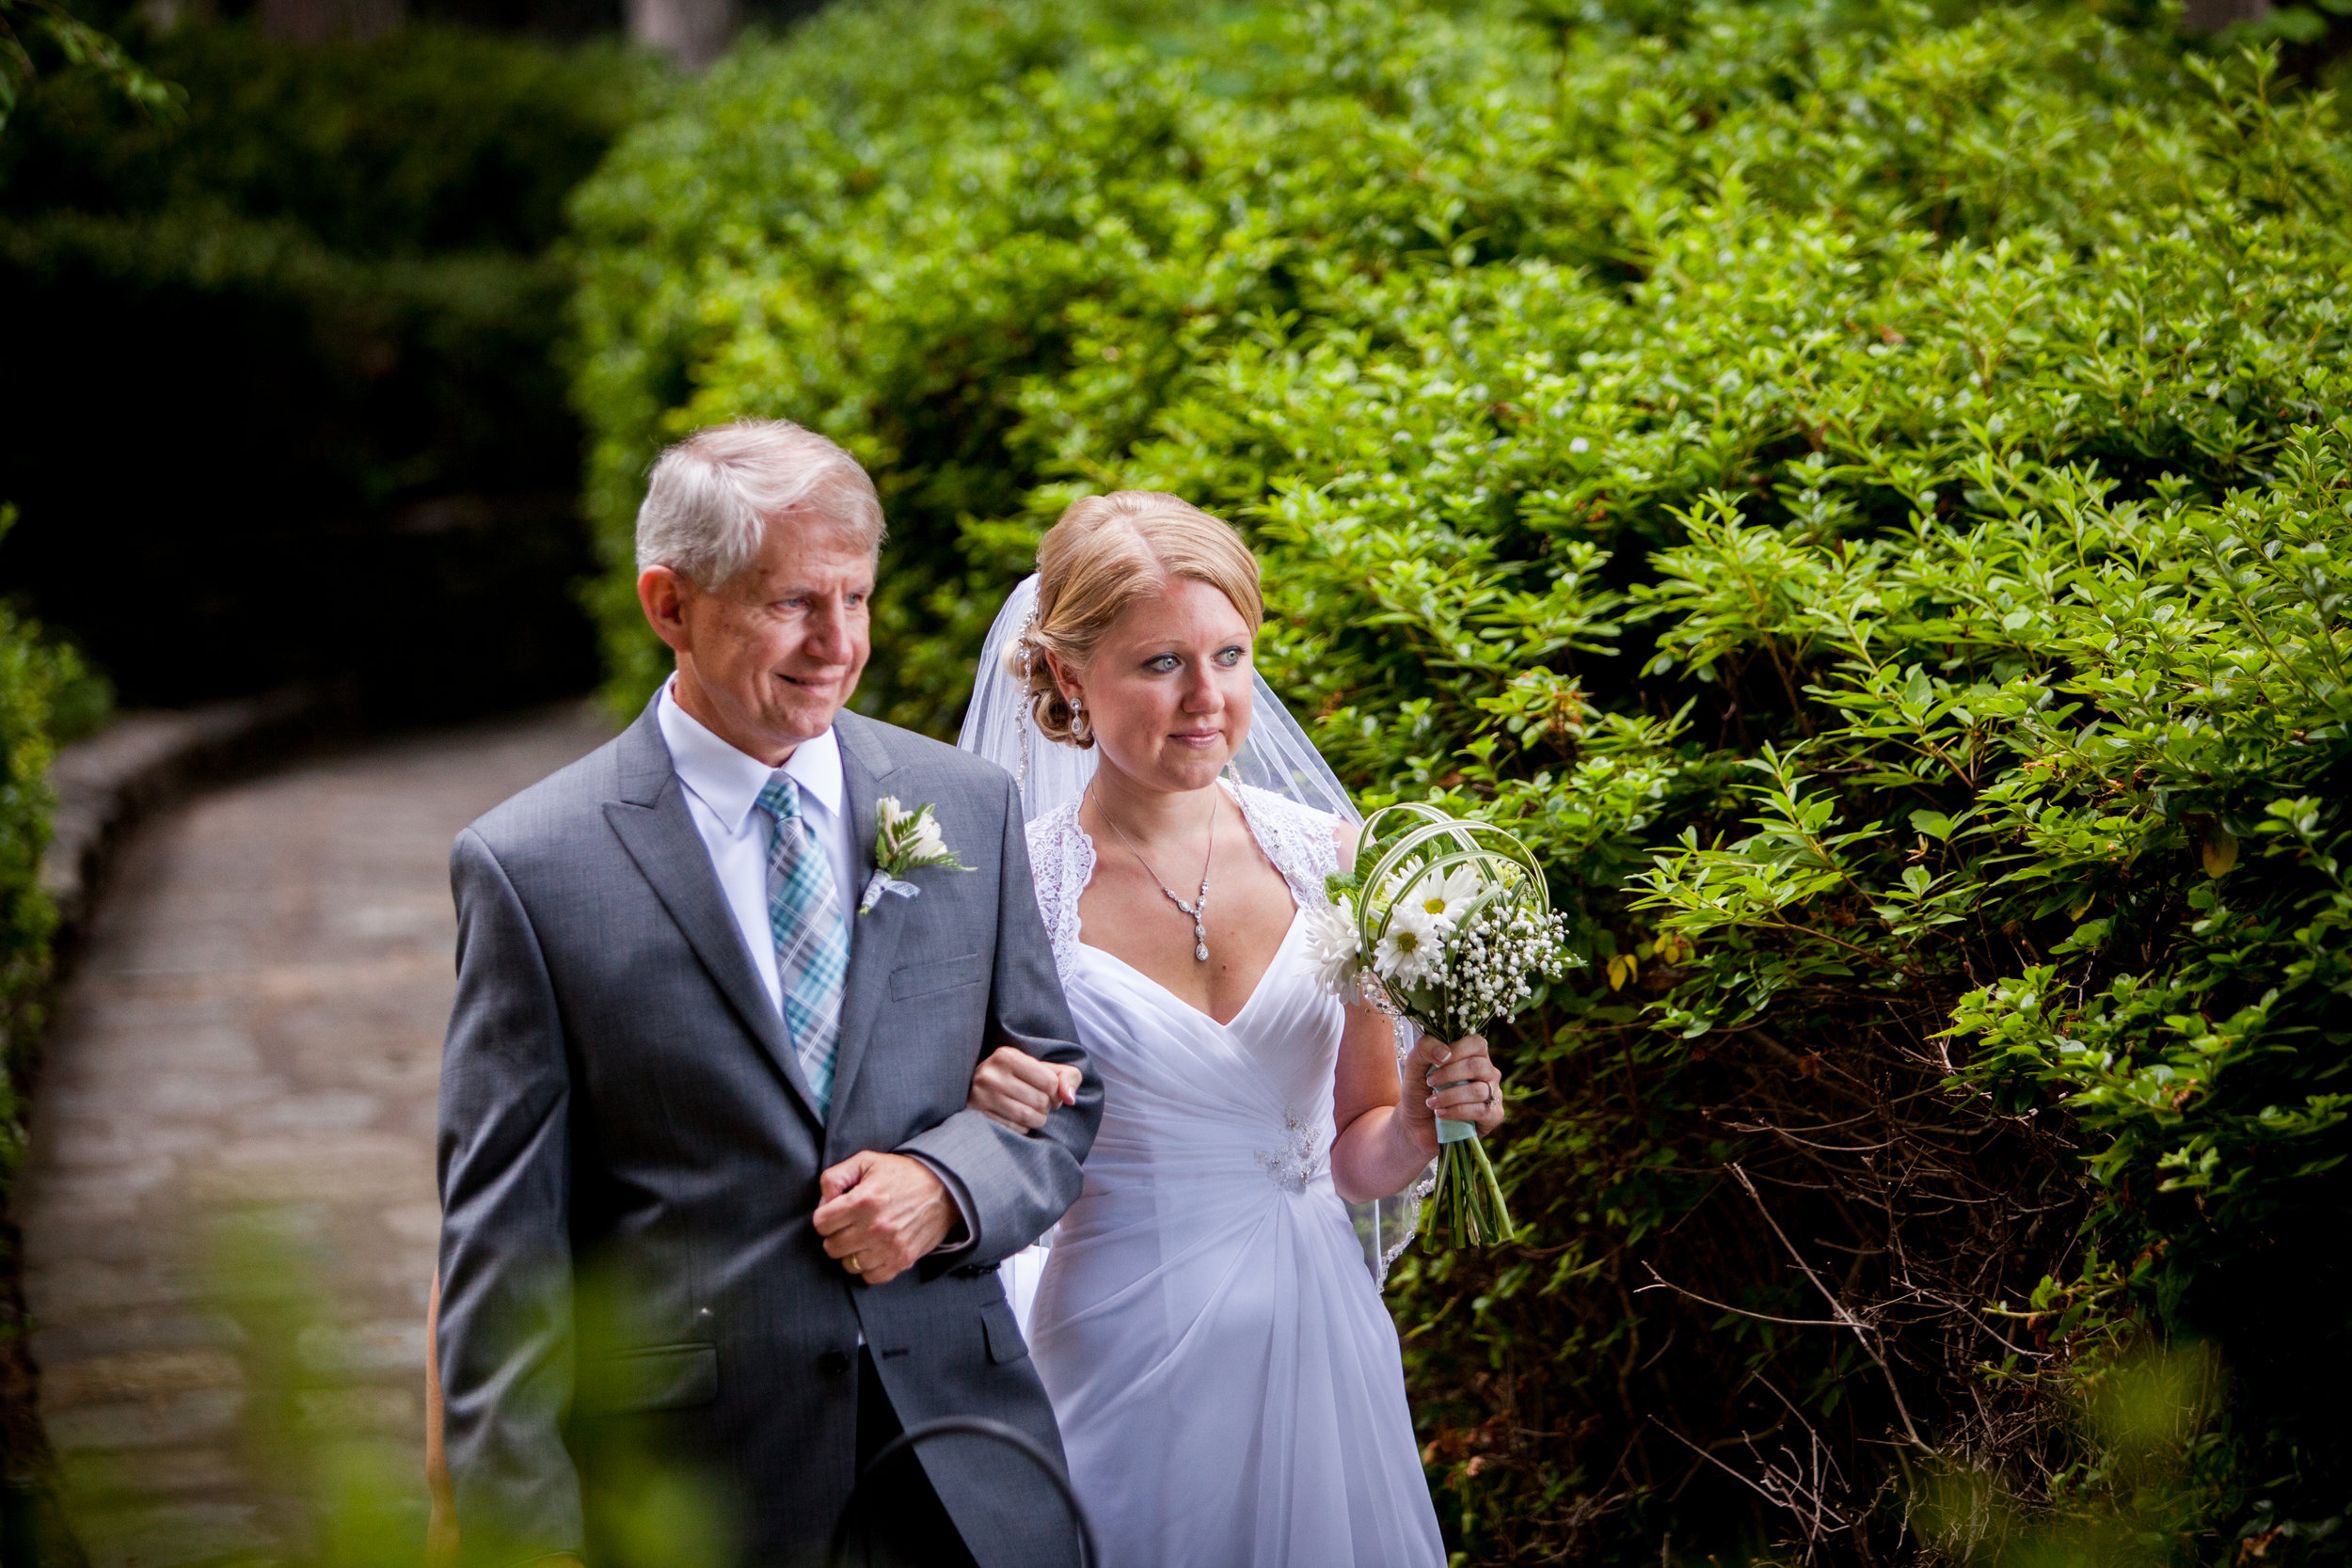 Celebrations-Midlothian-Wedding-Ceremony.jpg